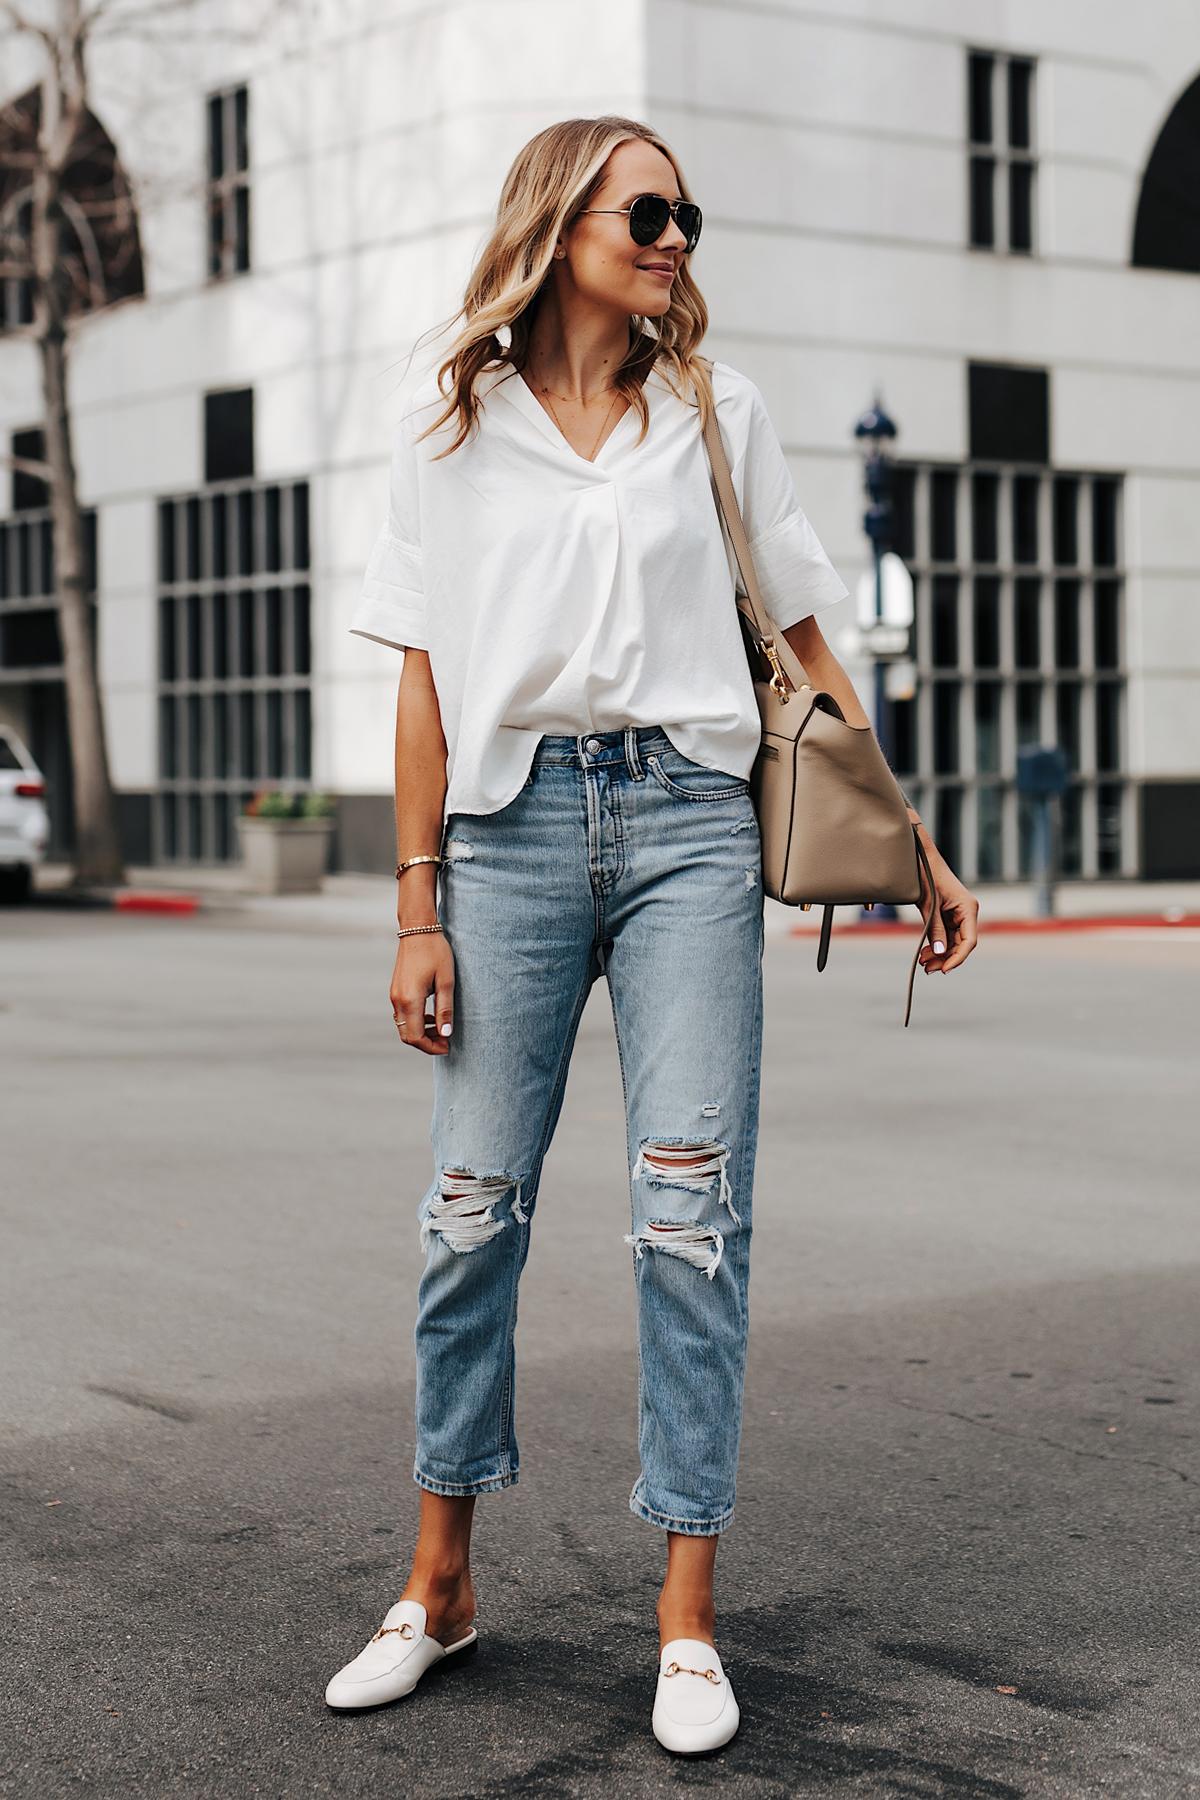 Fashion Jackson Wearing Short Sleeve White Shirt Everlane Ripped Boyfriend Jeans Gucci Princetown White Mules